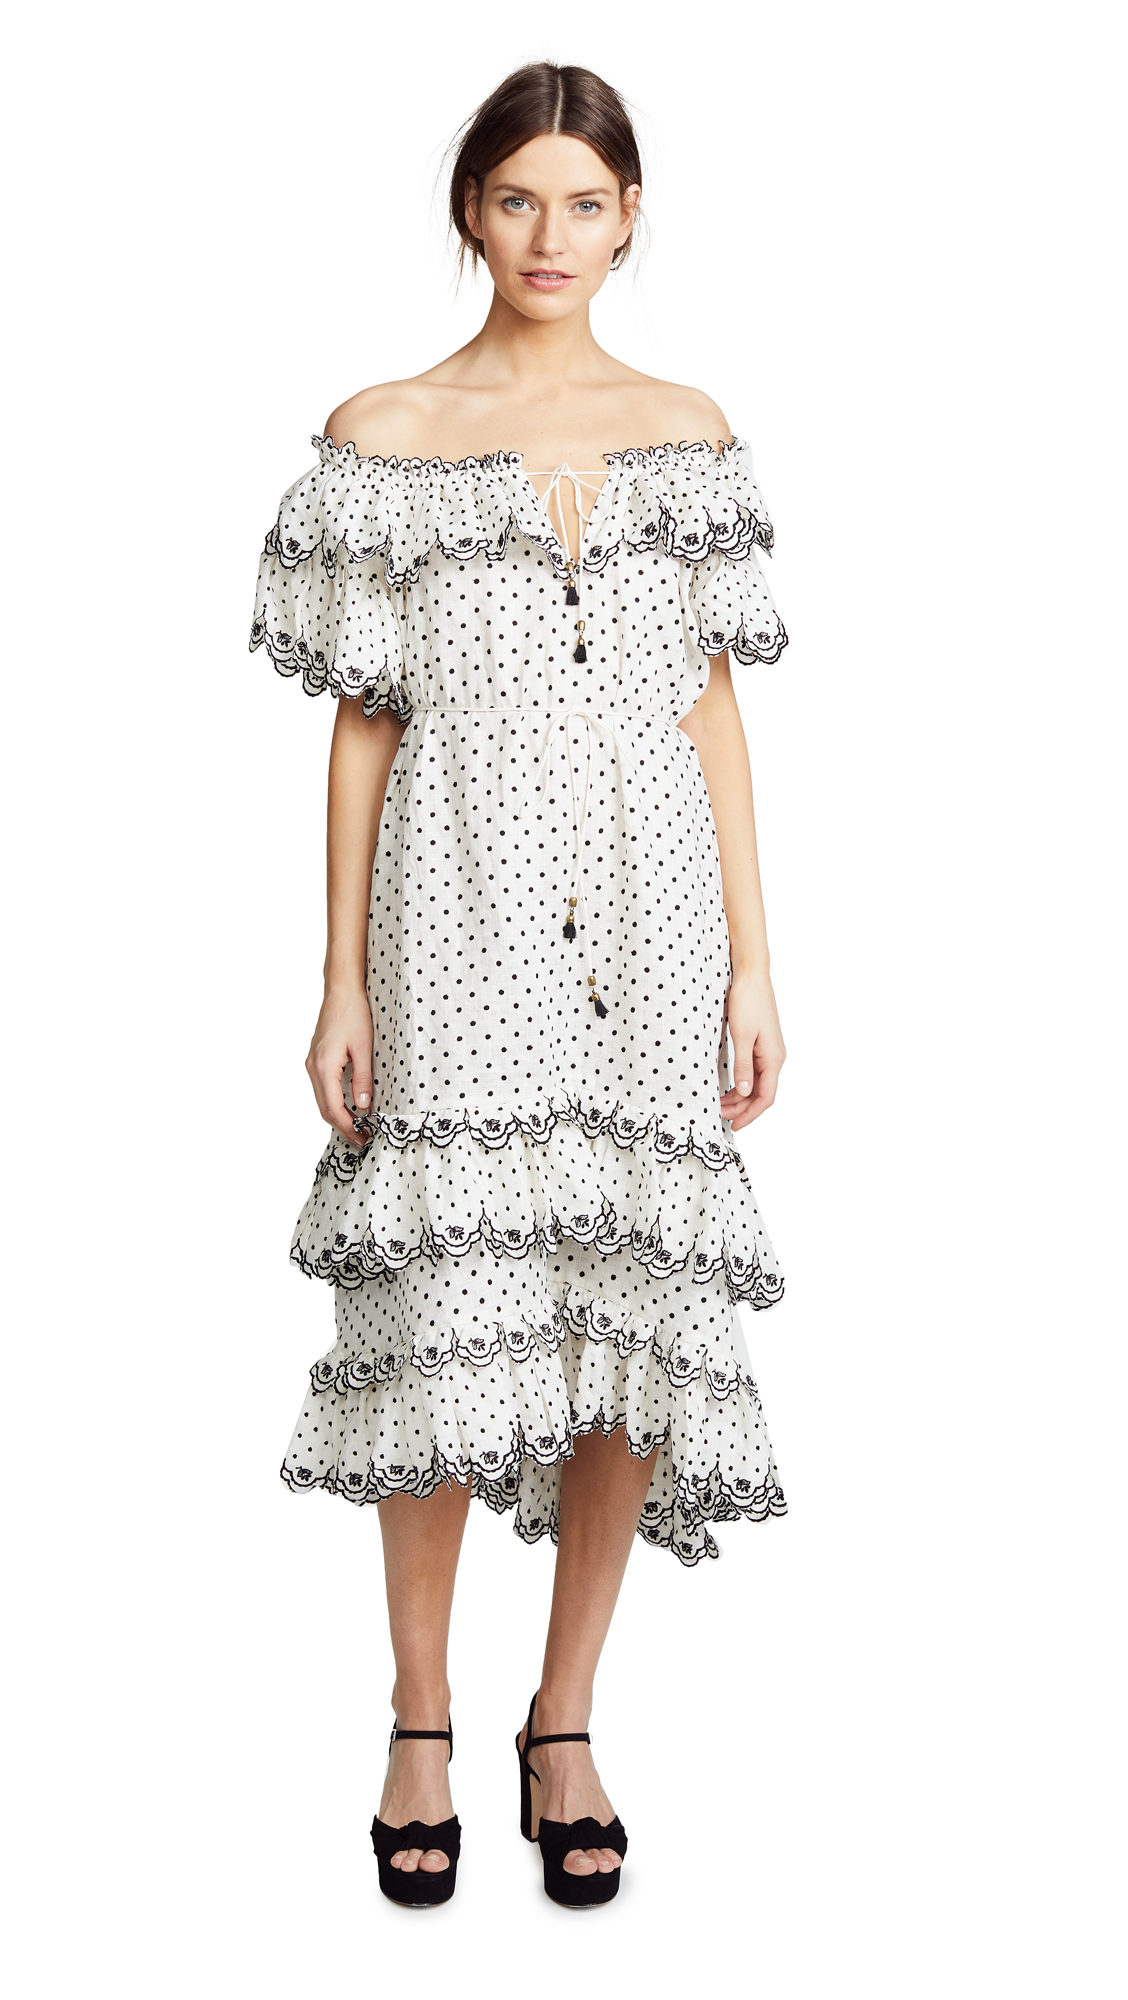 Zimmermann Jaya Scallop Tiered Long Dress - Cream/Black